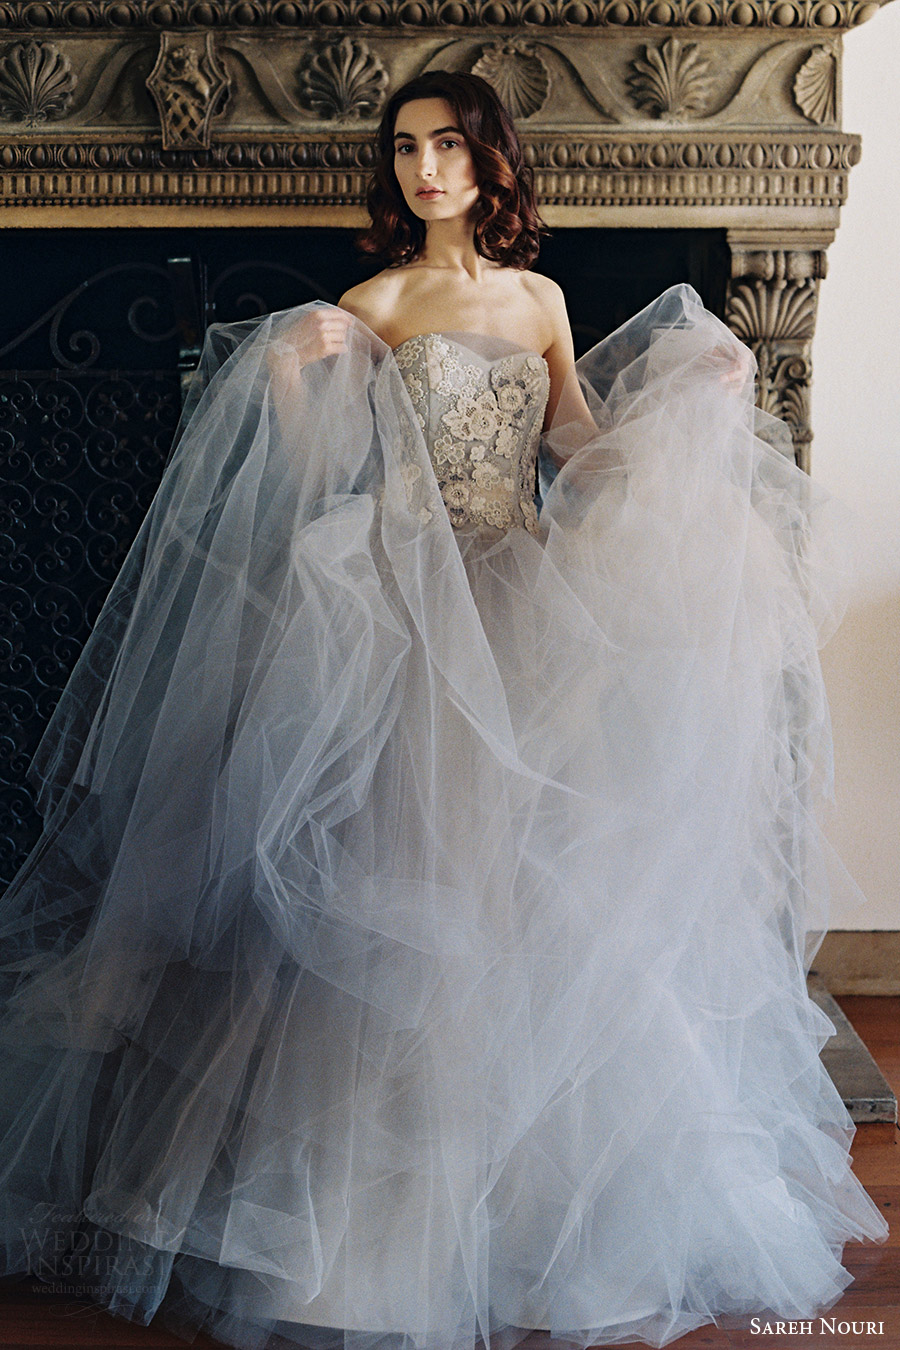 sareh nouri bridal spring 2017 strapless sweetheart ball gown wedding dress (iris) mv gray color